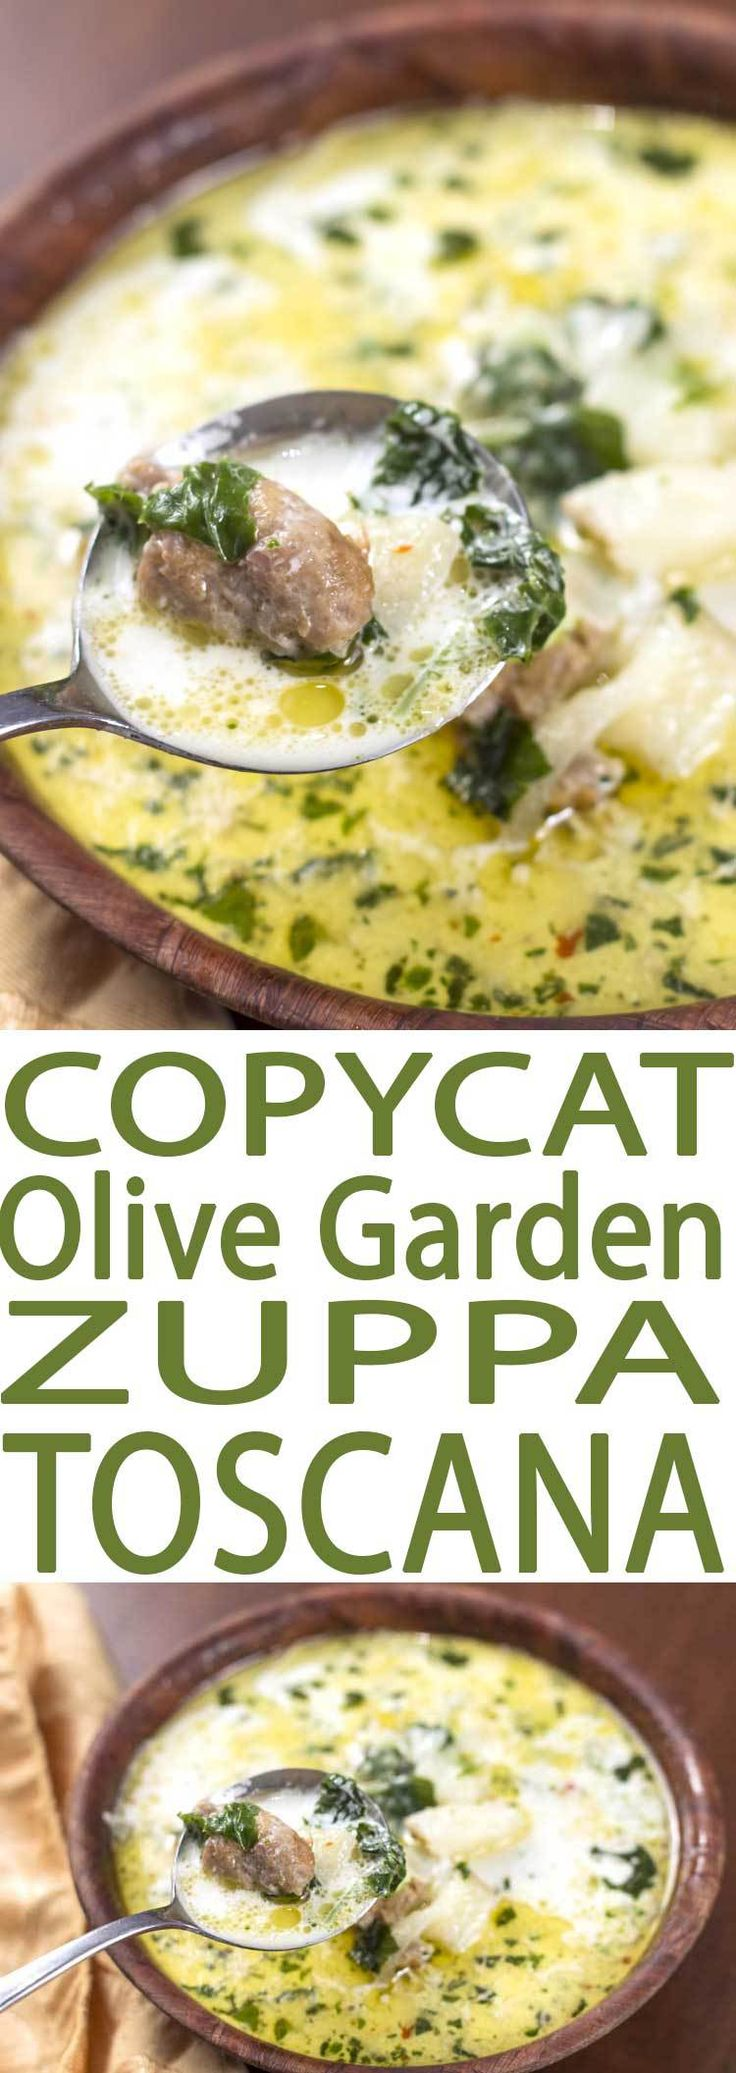 Copycat Olive Garden Zuppa Toscana Soup Recipe Gardens Olives And Zuppa Toscana Soup